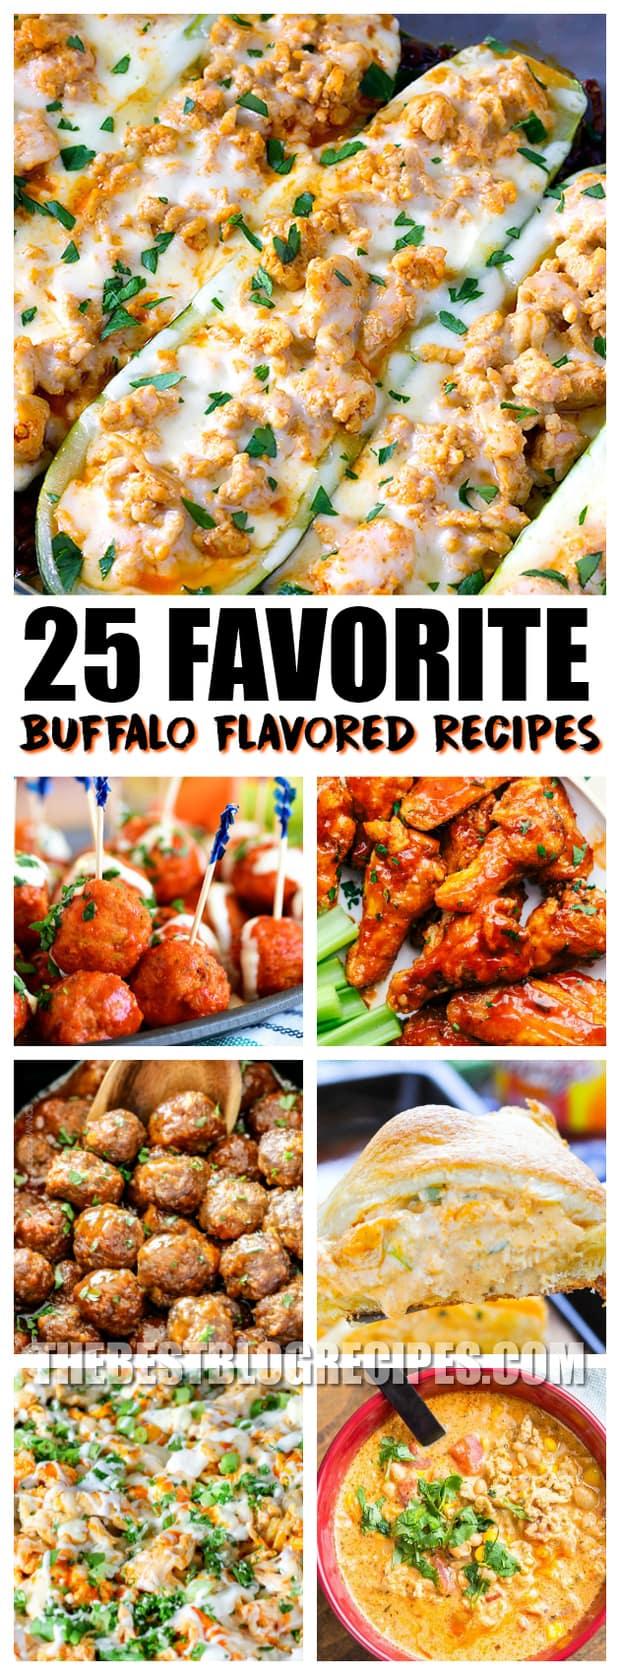 25 Favorite Buffalo Flavored Recipes